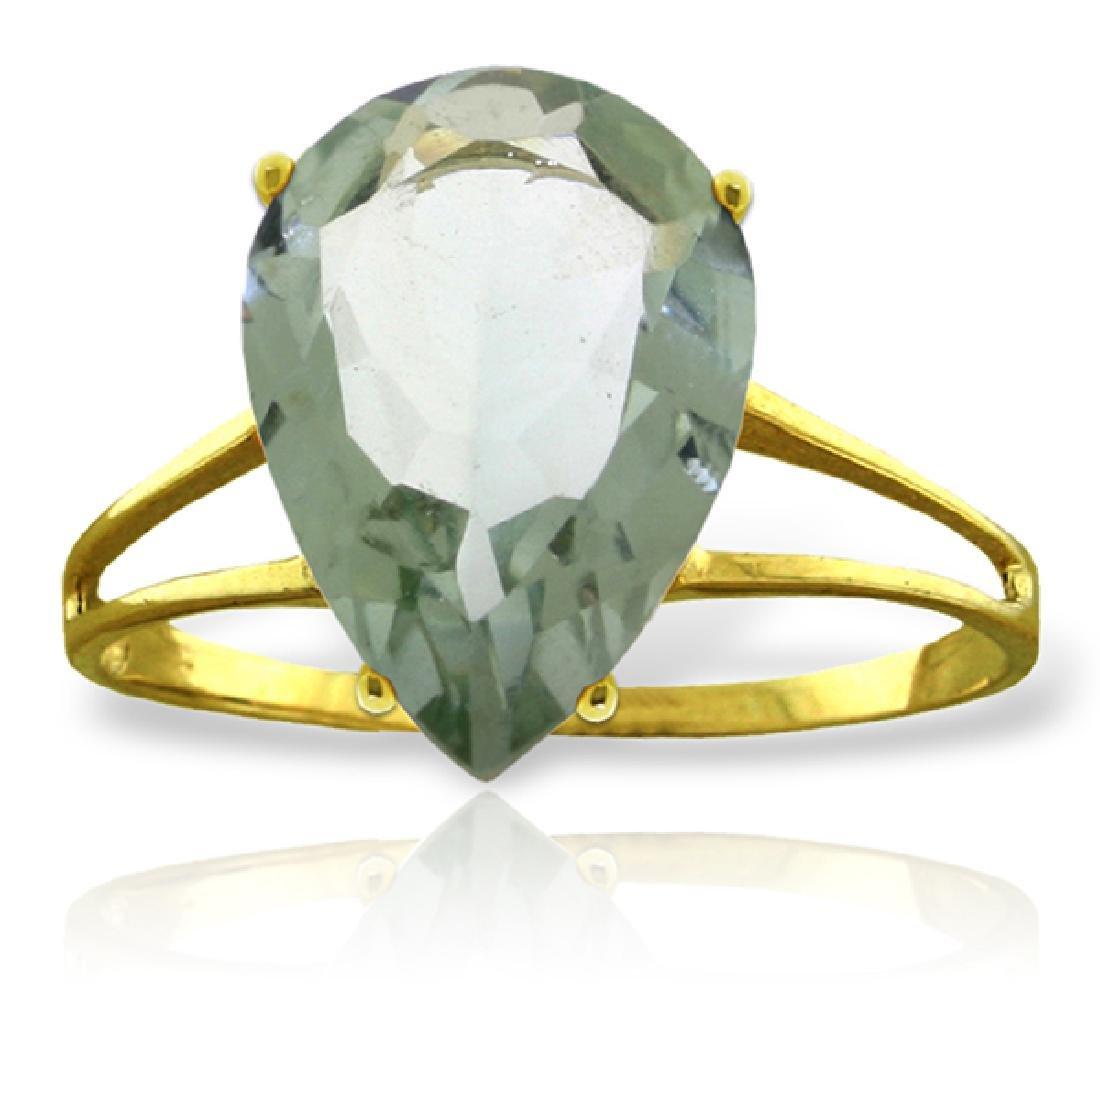 Genuine 5 ctw Green Amethyst Ring Jewelry 14KT Yellow